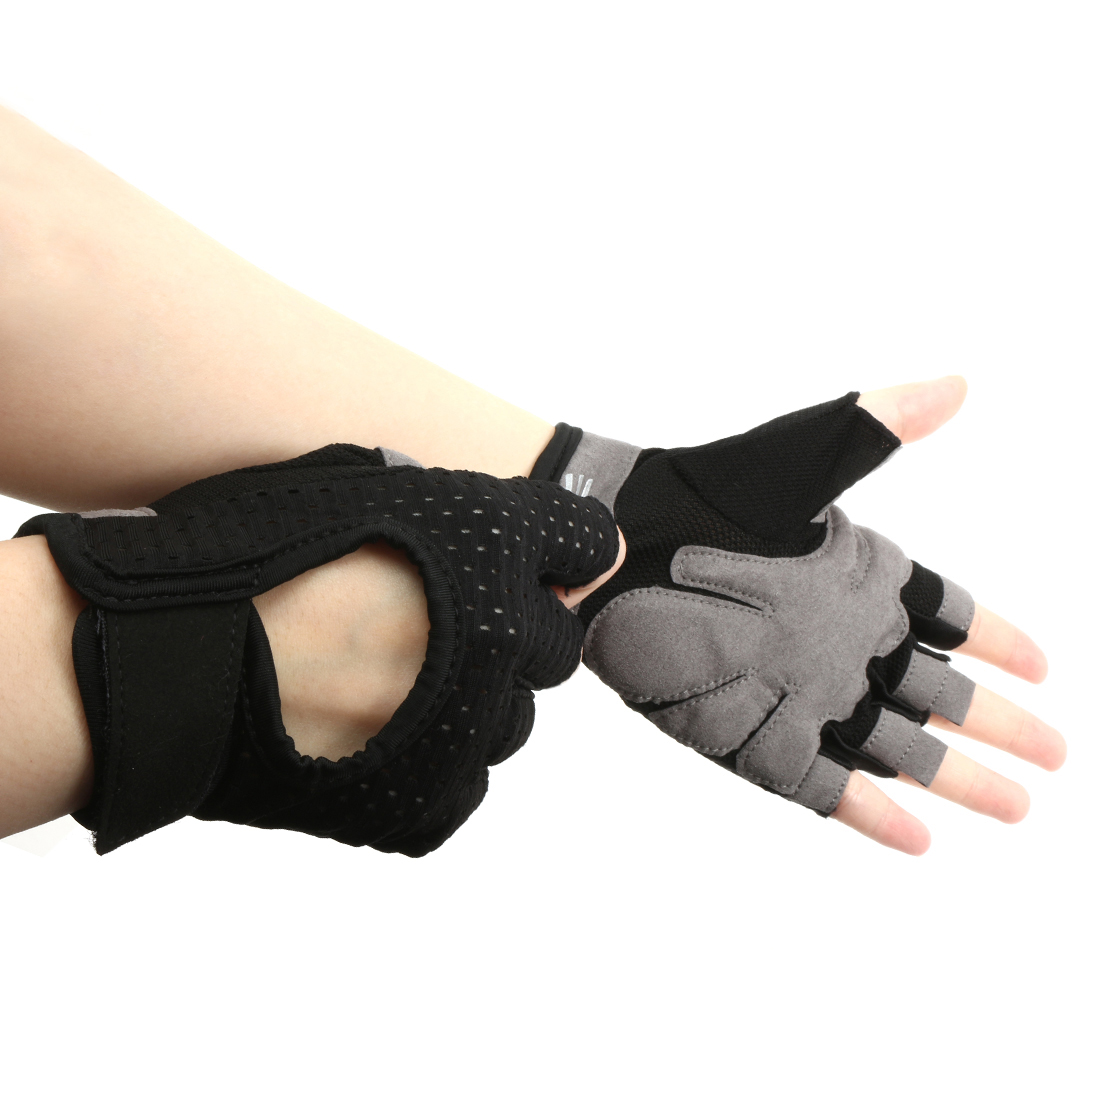 Fashion Lightweight Cycling Bike Gloves Outdoor Anti-slip Black